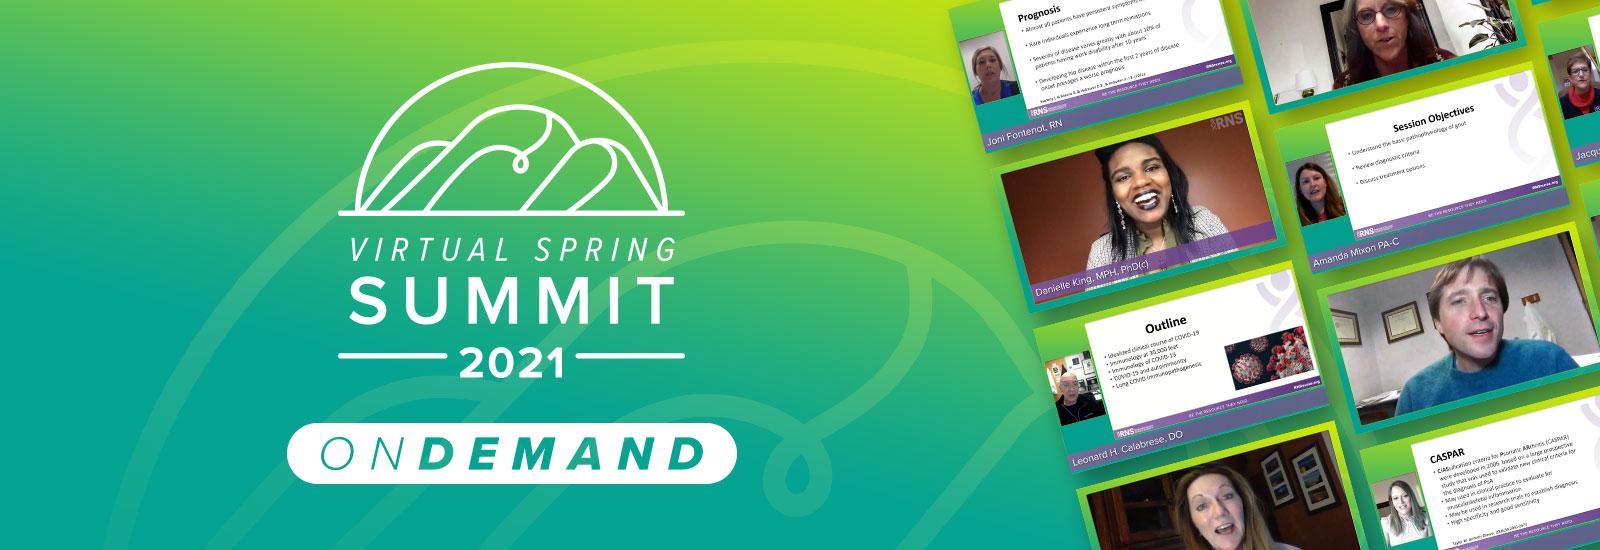 2021 RNS Virtual Spring Summit OnDemand